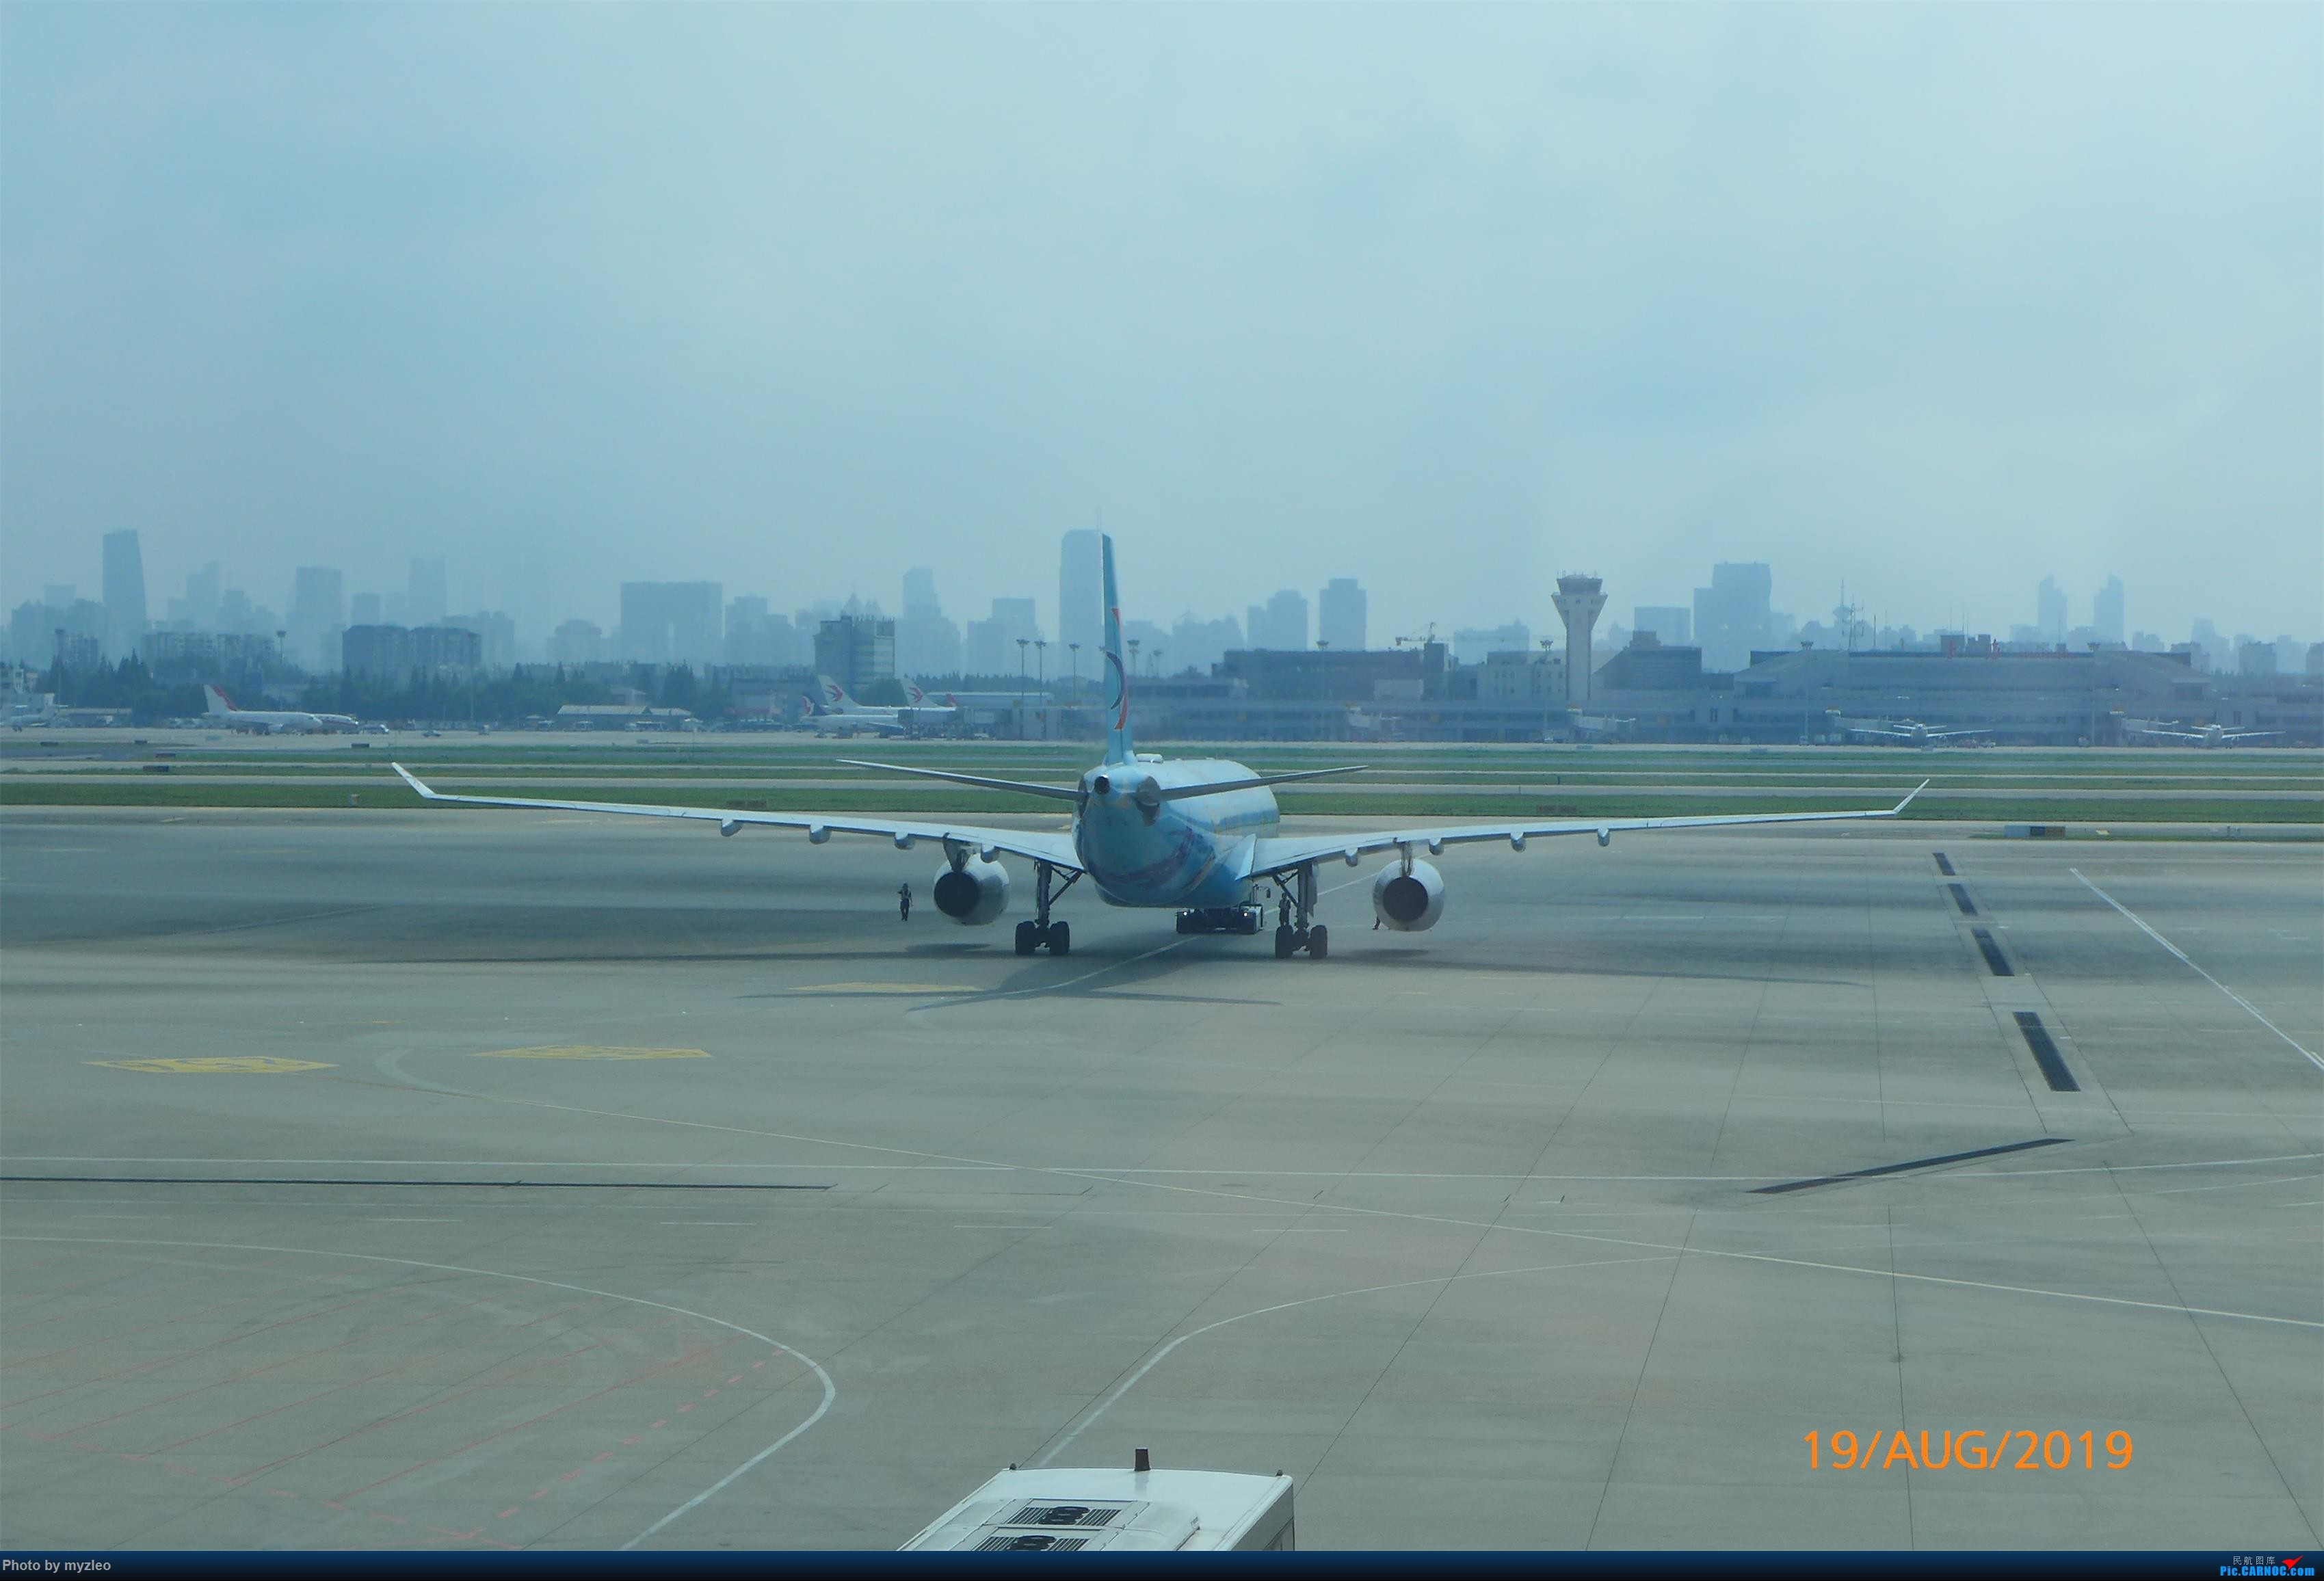 Re:[原创]【myzleo的游记5.1】梦圆一九(1)首搭国航359,北京城里到处走 AIRBUS A330-300 B-5976 中国上海虹桥国际机场